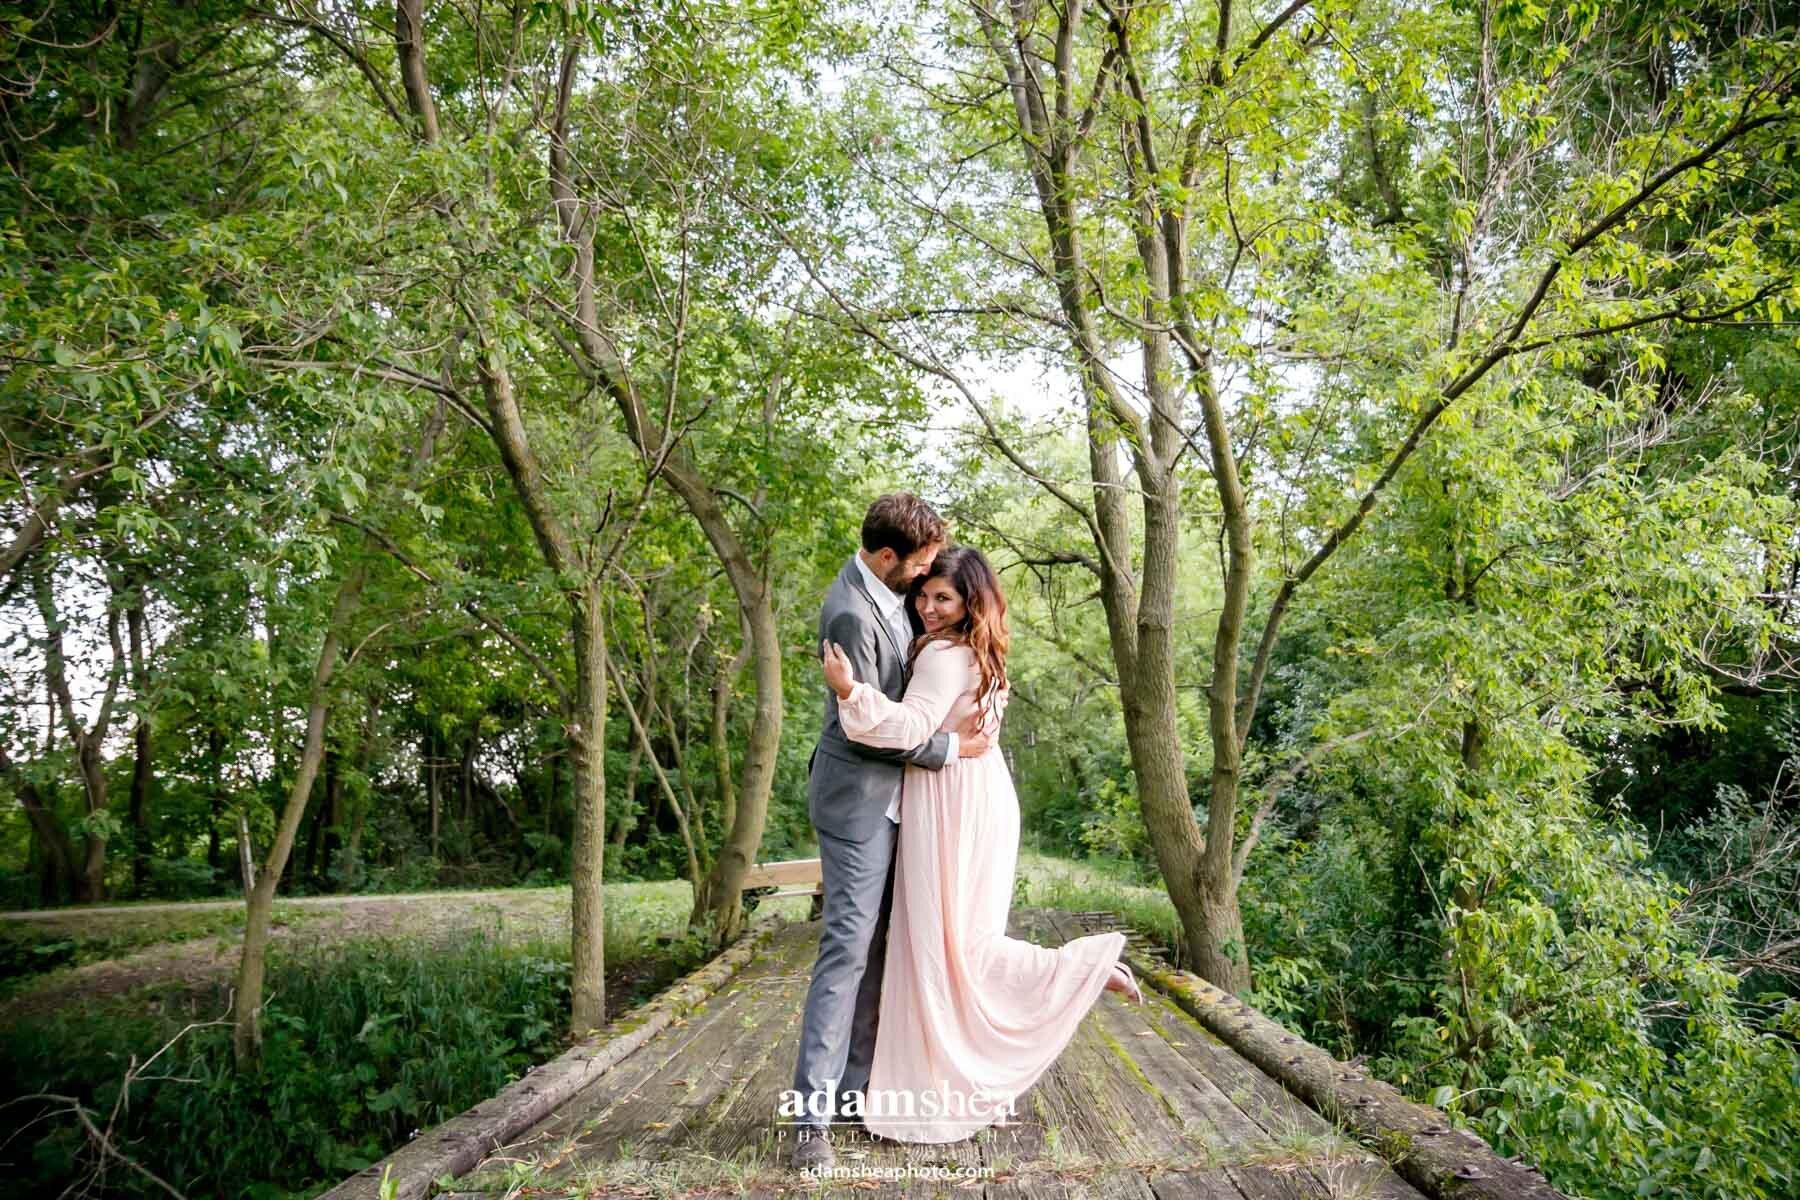 amy-adam-engagement-photos-larsen-wi-neenah-winding-trail-flowy-dress-grey-suit-adam-shea-photography-green-bay-appleton-neenah-photographer-12.jpg